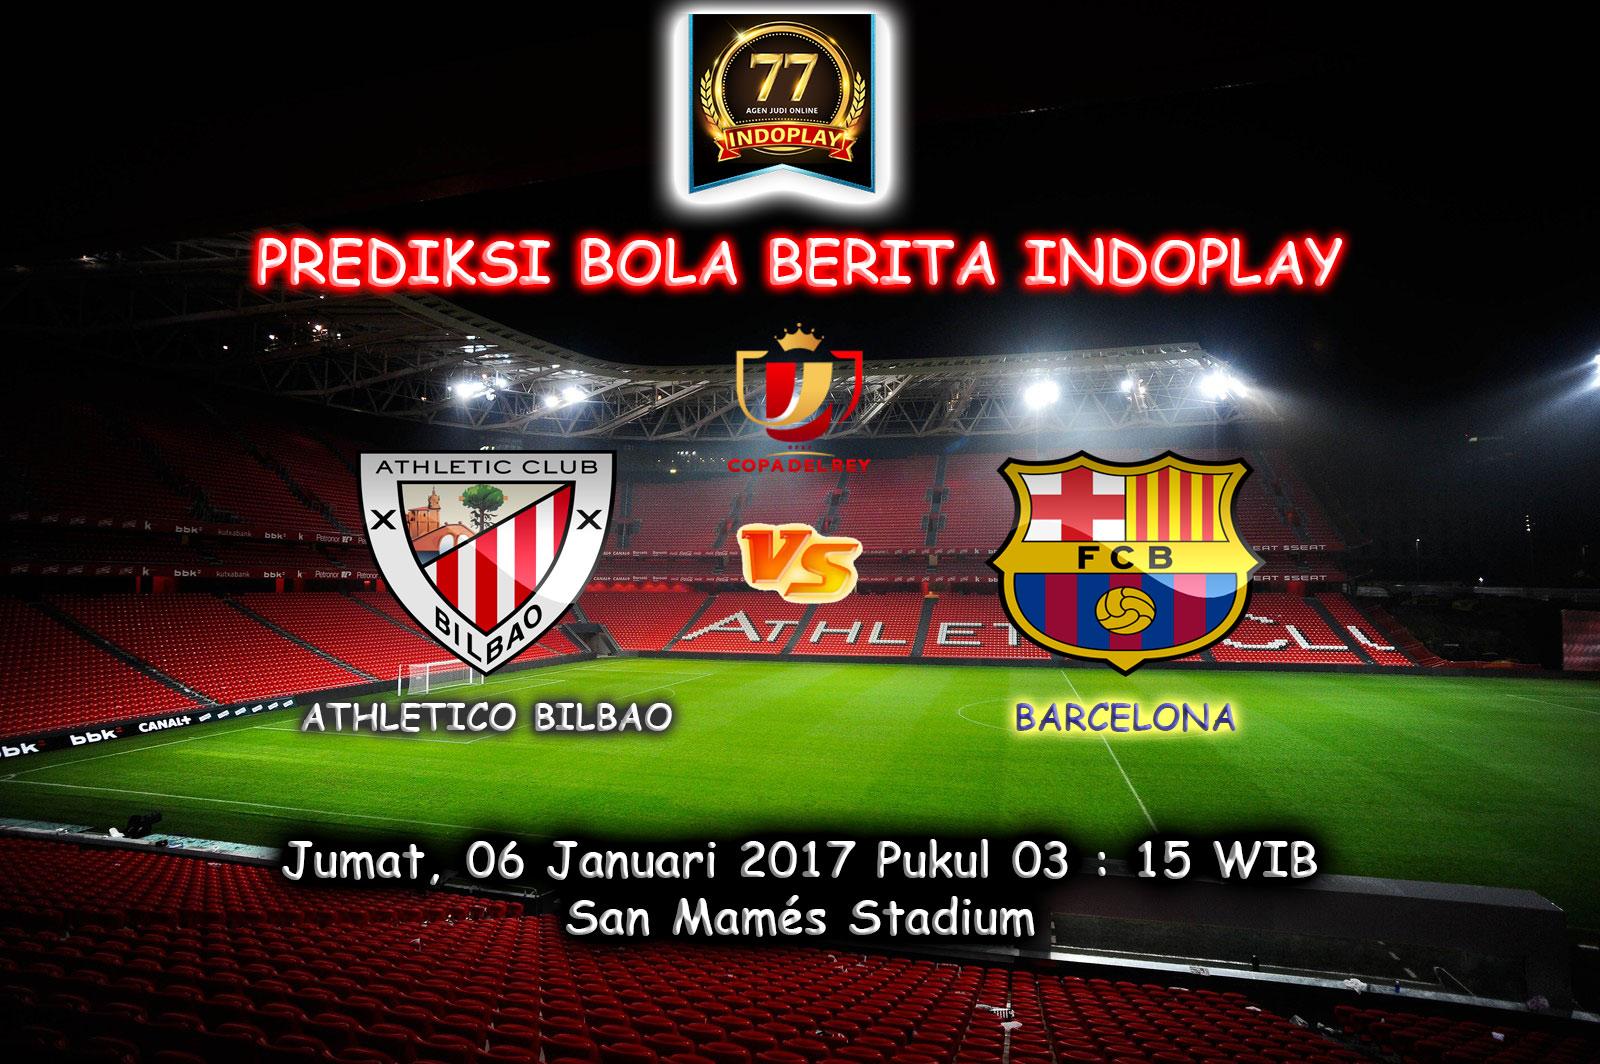 Prediksi Athletic Bilbao Vs Barcelona, Jumat 06 Januari 2017- Pertandingan Copa Del Rey antara Atletic Bilbao Vs Barcelona di Nuevo San Mamés pukul 03 : 15 WIB.